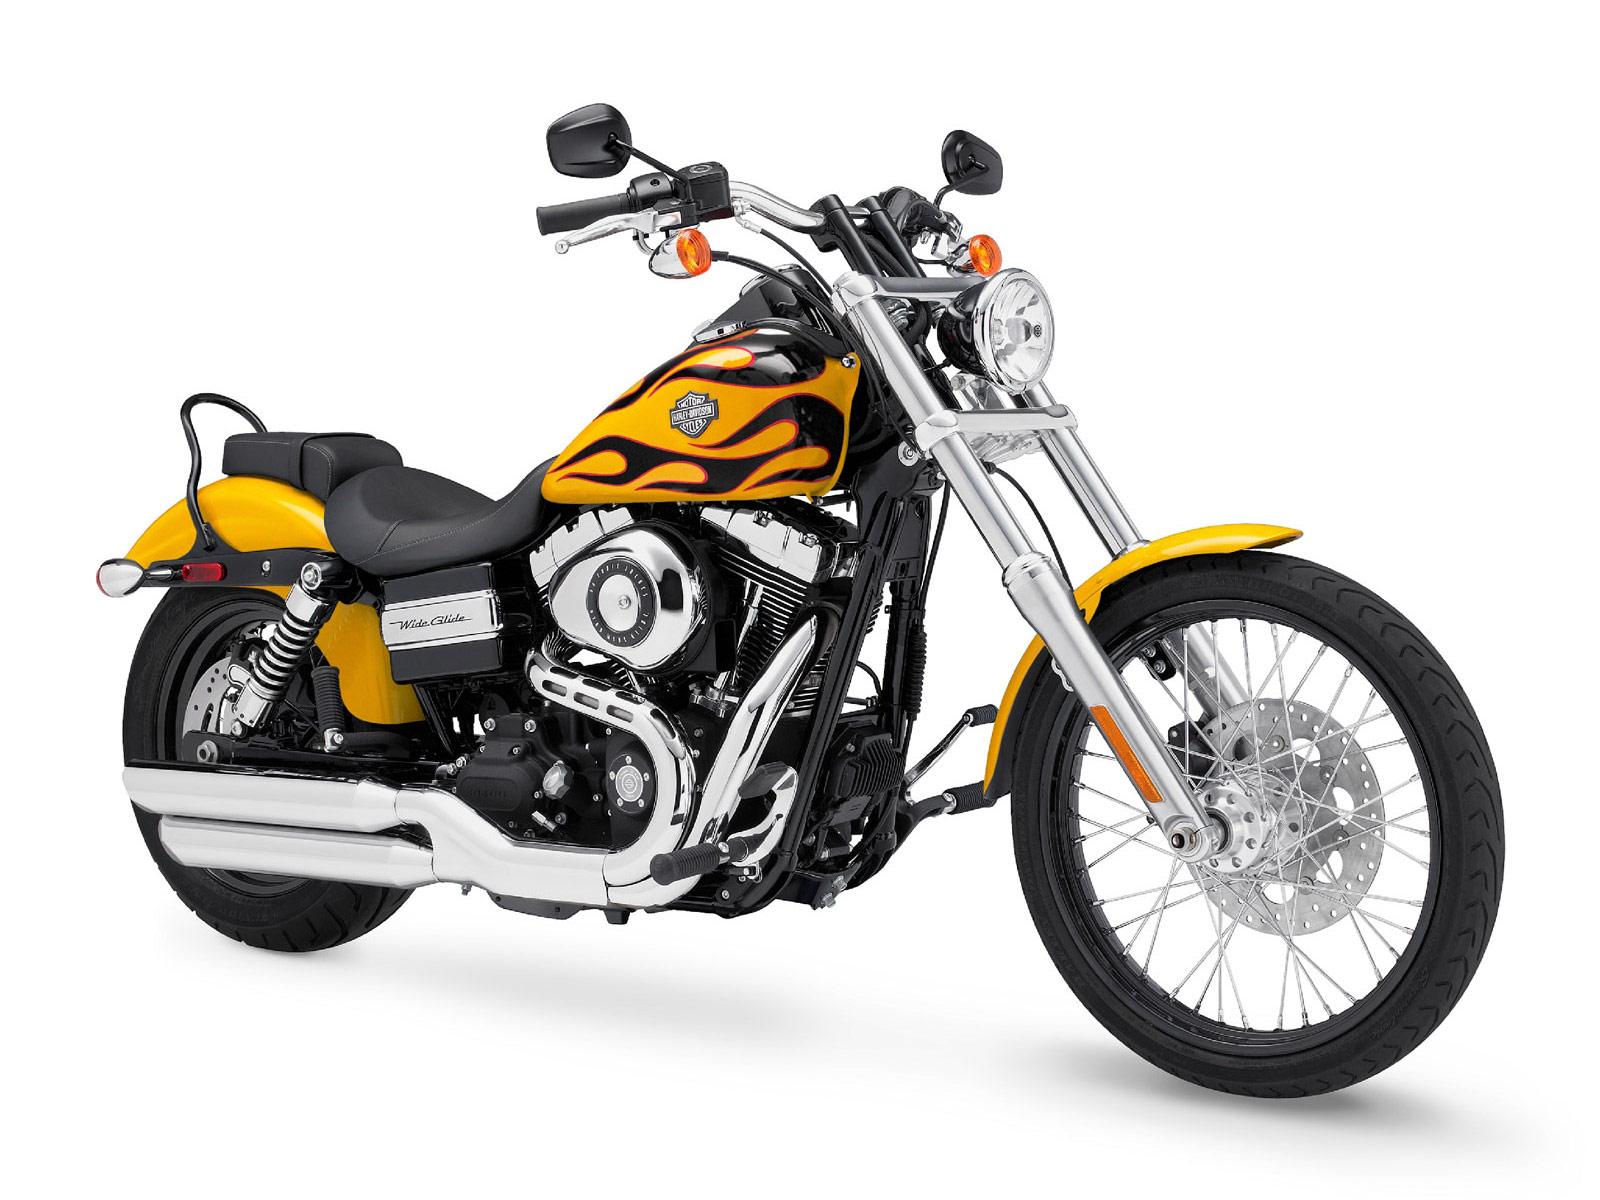 All Bout Cars Harley Davidson Super Glide Dyna: 2011 FXDWG Dyna Wide Glide Harley-Davidson Pictures